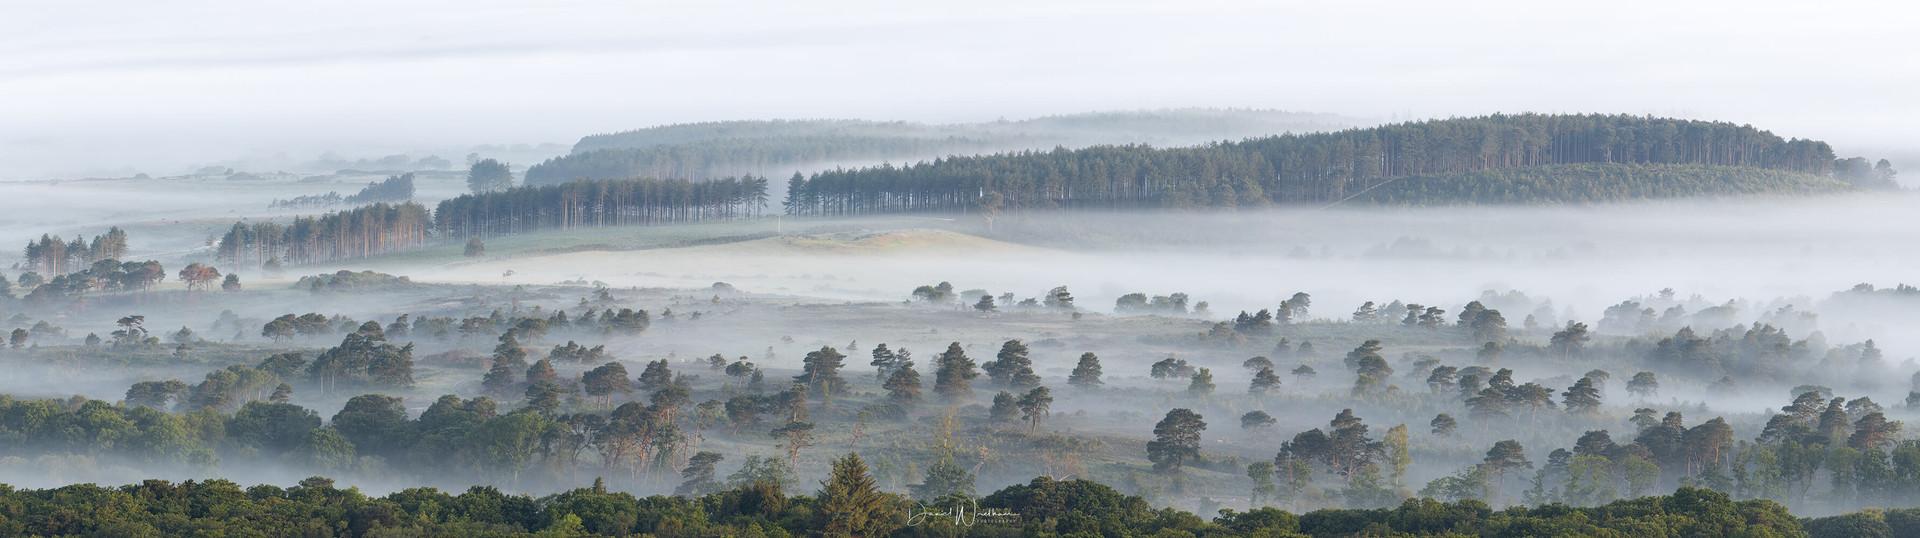 Dorset Mist Panorama